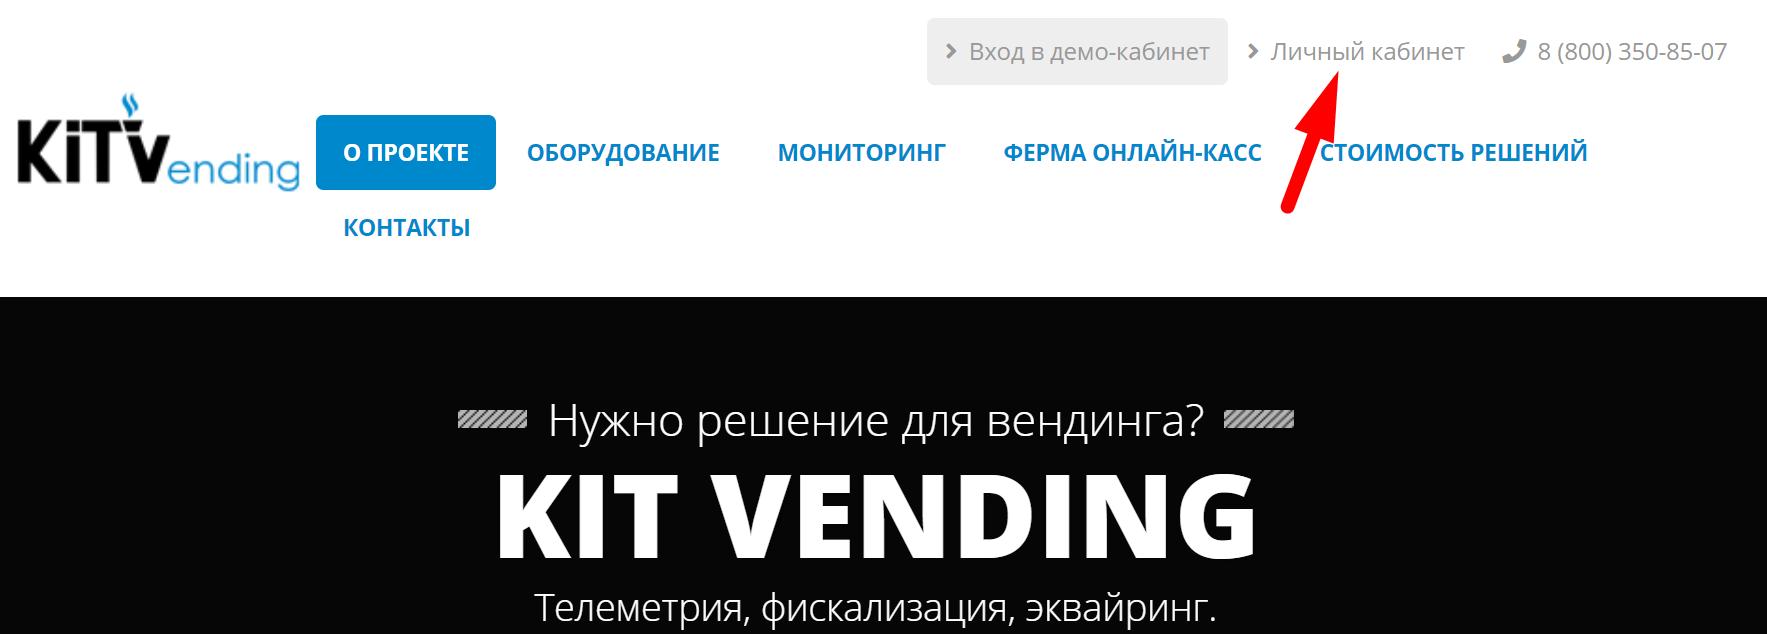 Ссылка на сайт компании «Кит Вендинг»